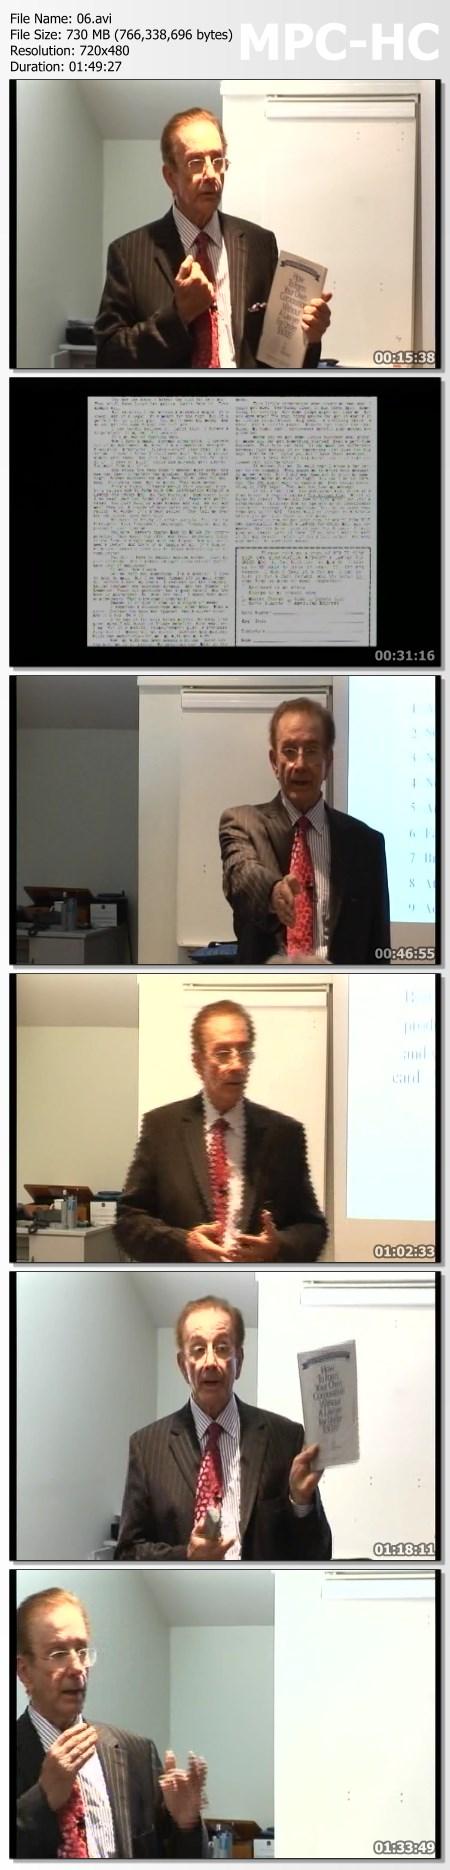 Ted Nicholas - Copywriting For Success (UP) 1